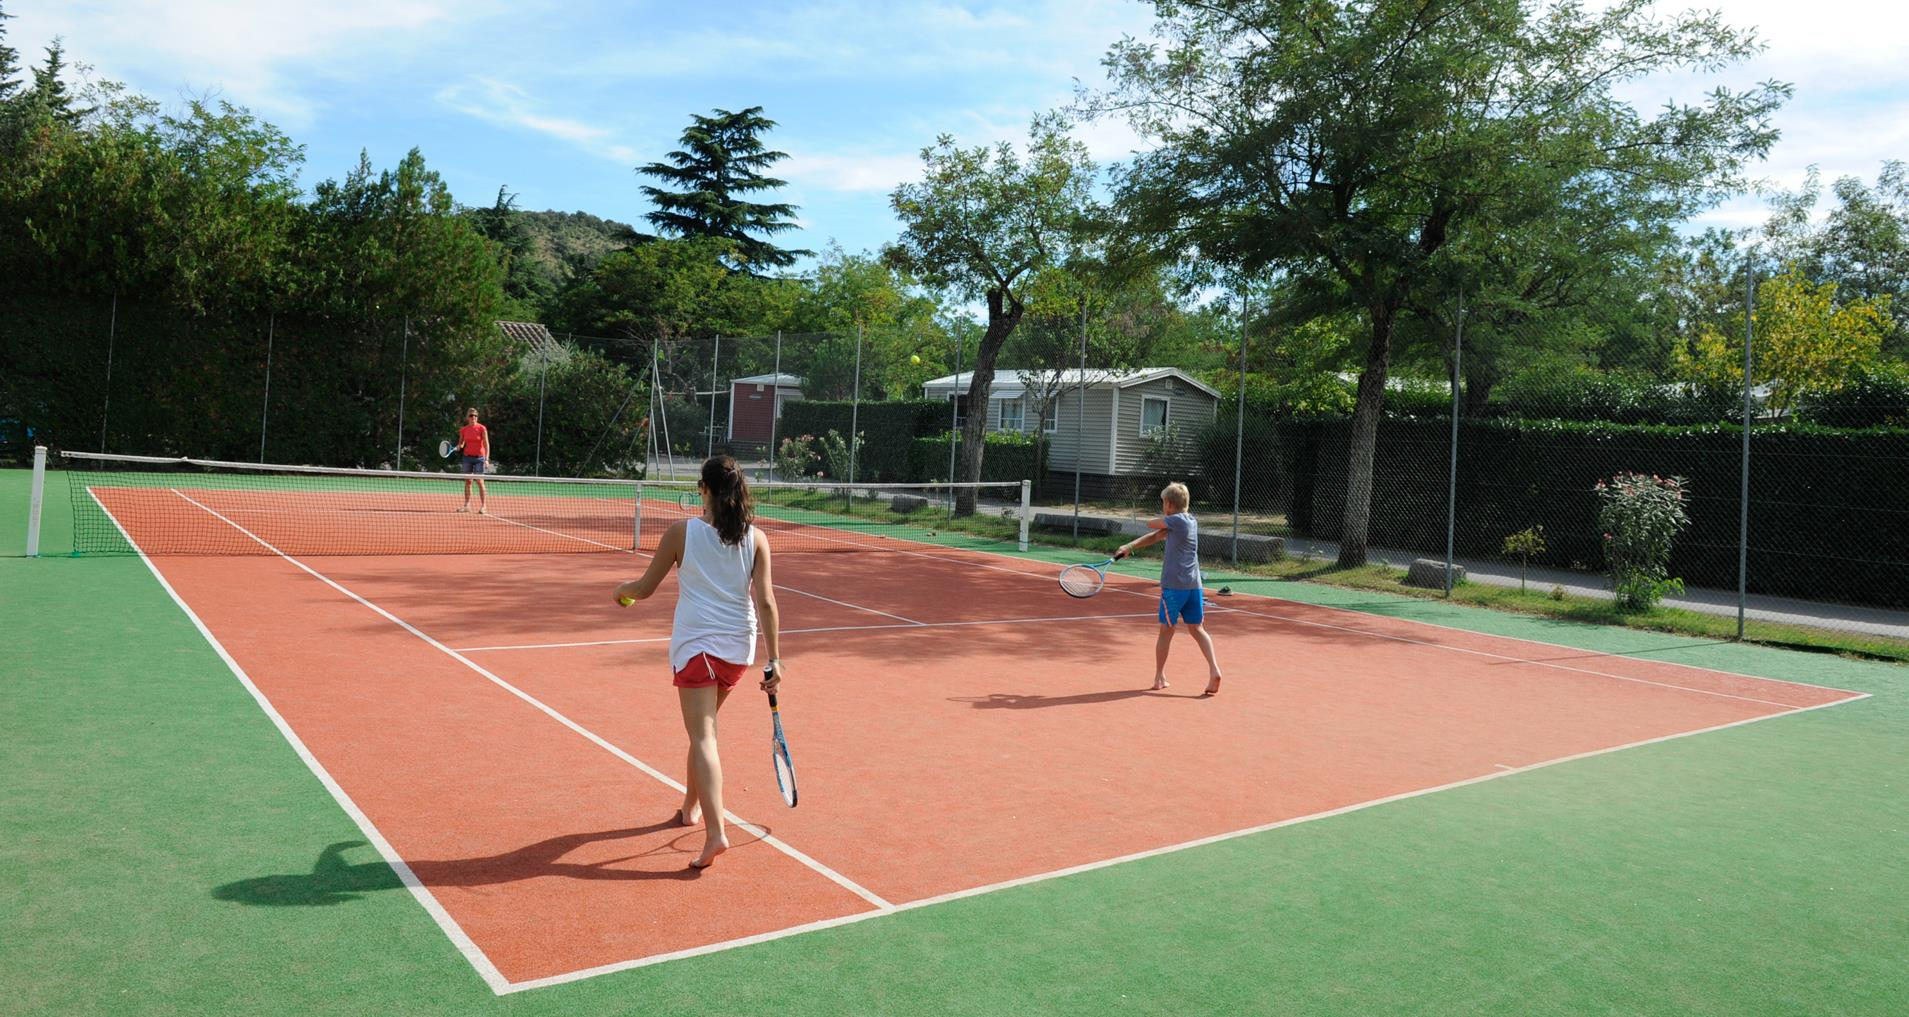 Camping en ard che avec tennis yelloh village soleil for Terrain de tennis taille